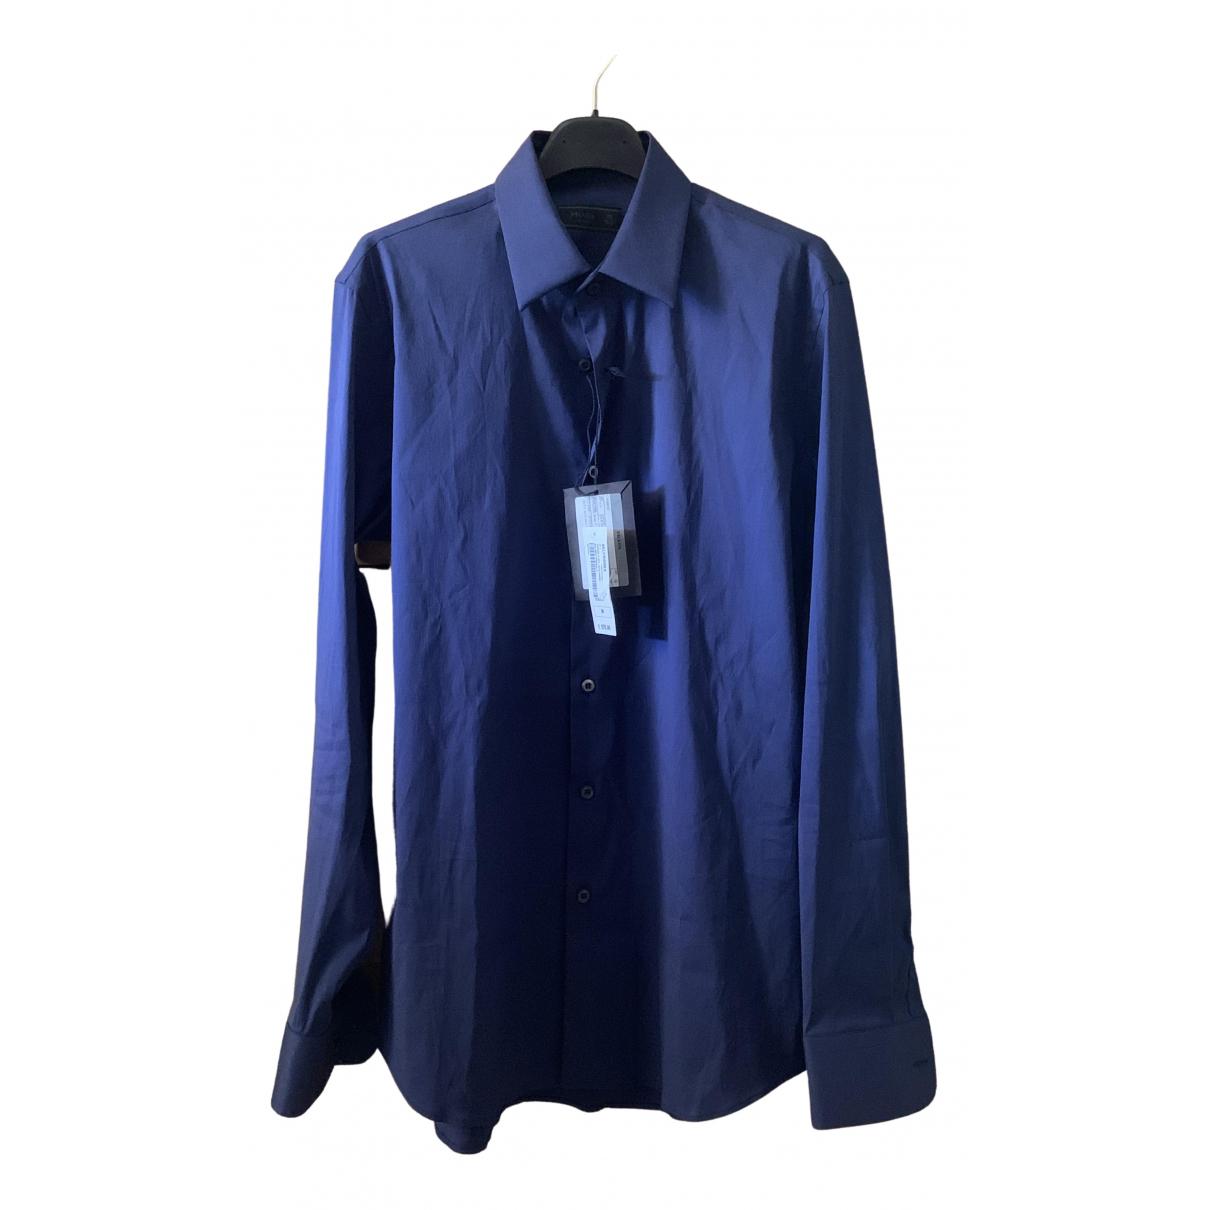 Prada \N Blue Cotton Shirts for Men 39 EU (tour de cou / collar)